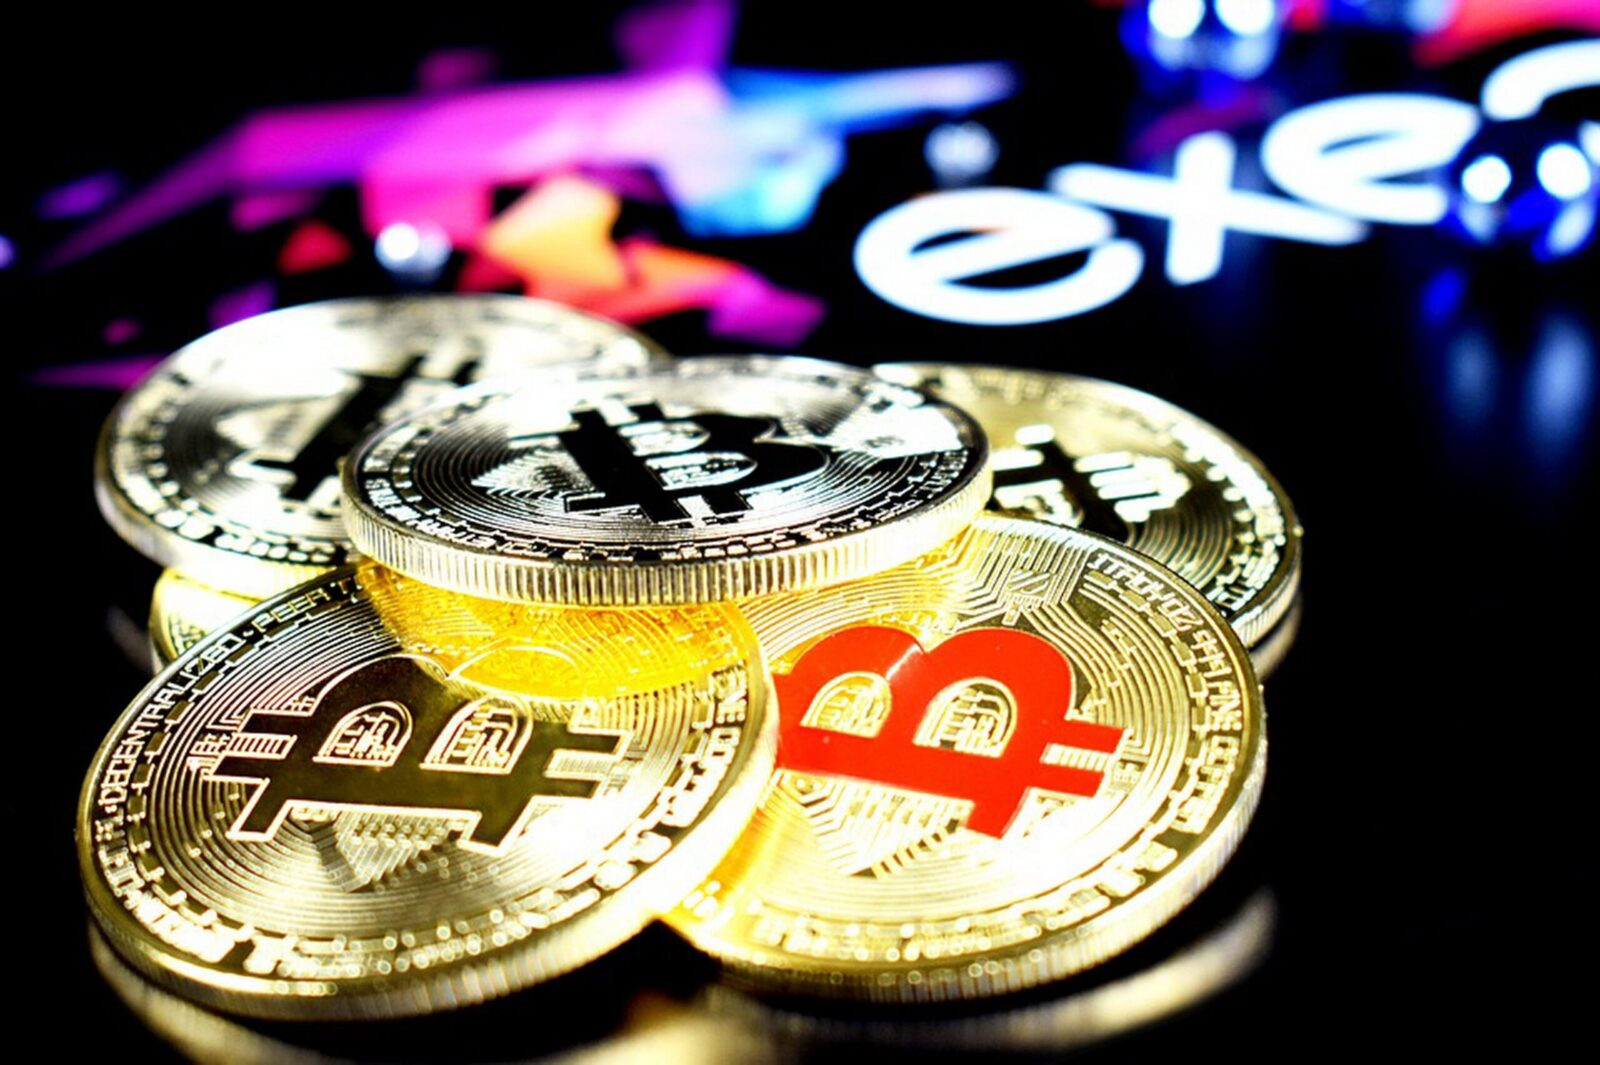 Bitcoins kaufen bargeld verbot sports betting shop software